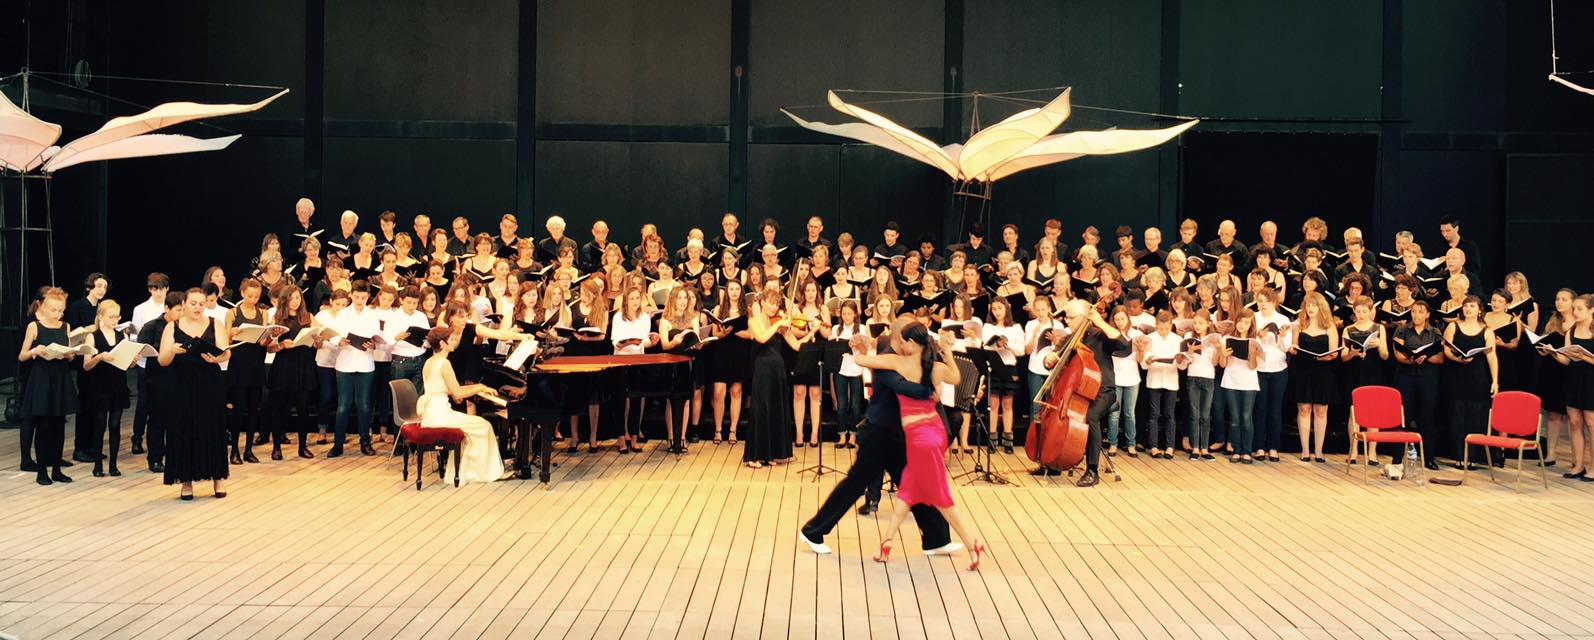 Dancers from Opera Junior Misa Tango concert